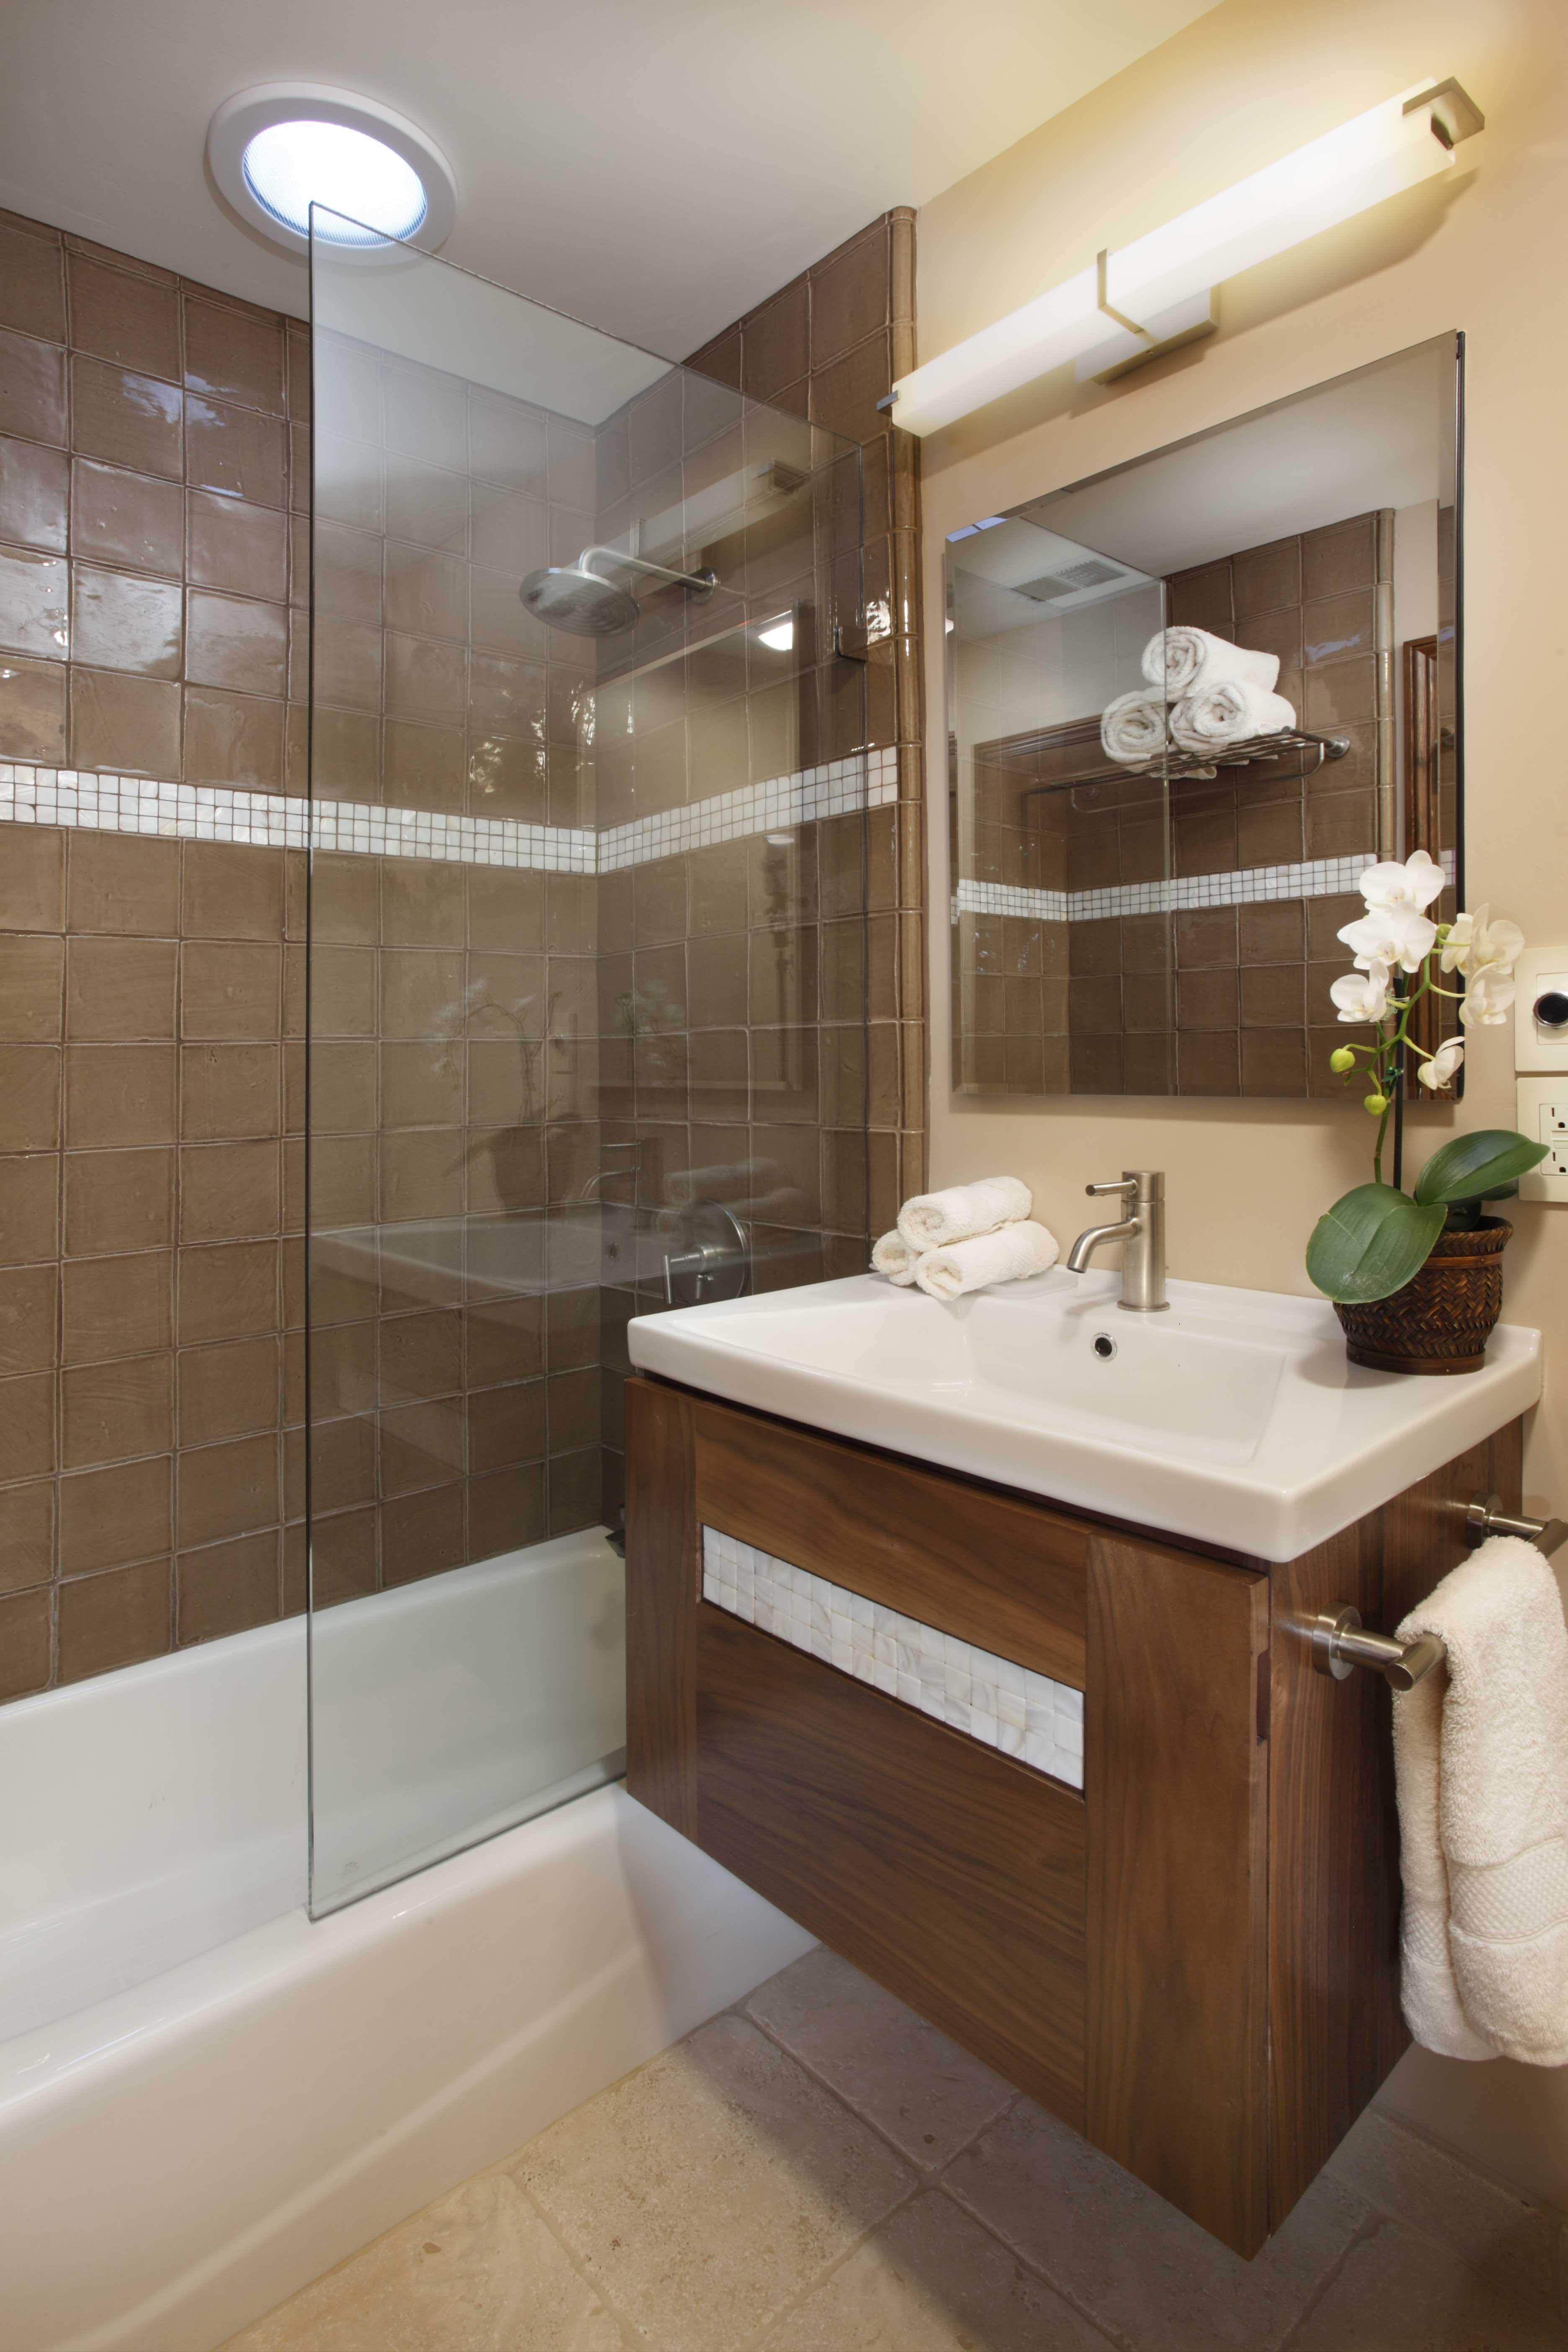 Eco friendly kitchen bathroom renovations for Eco friendly bathroom design ideas